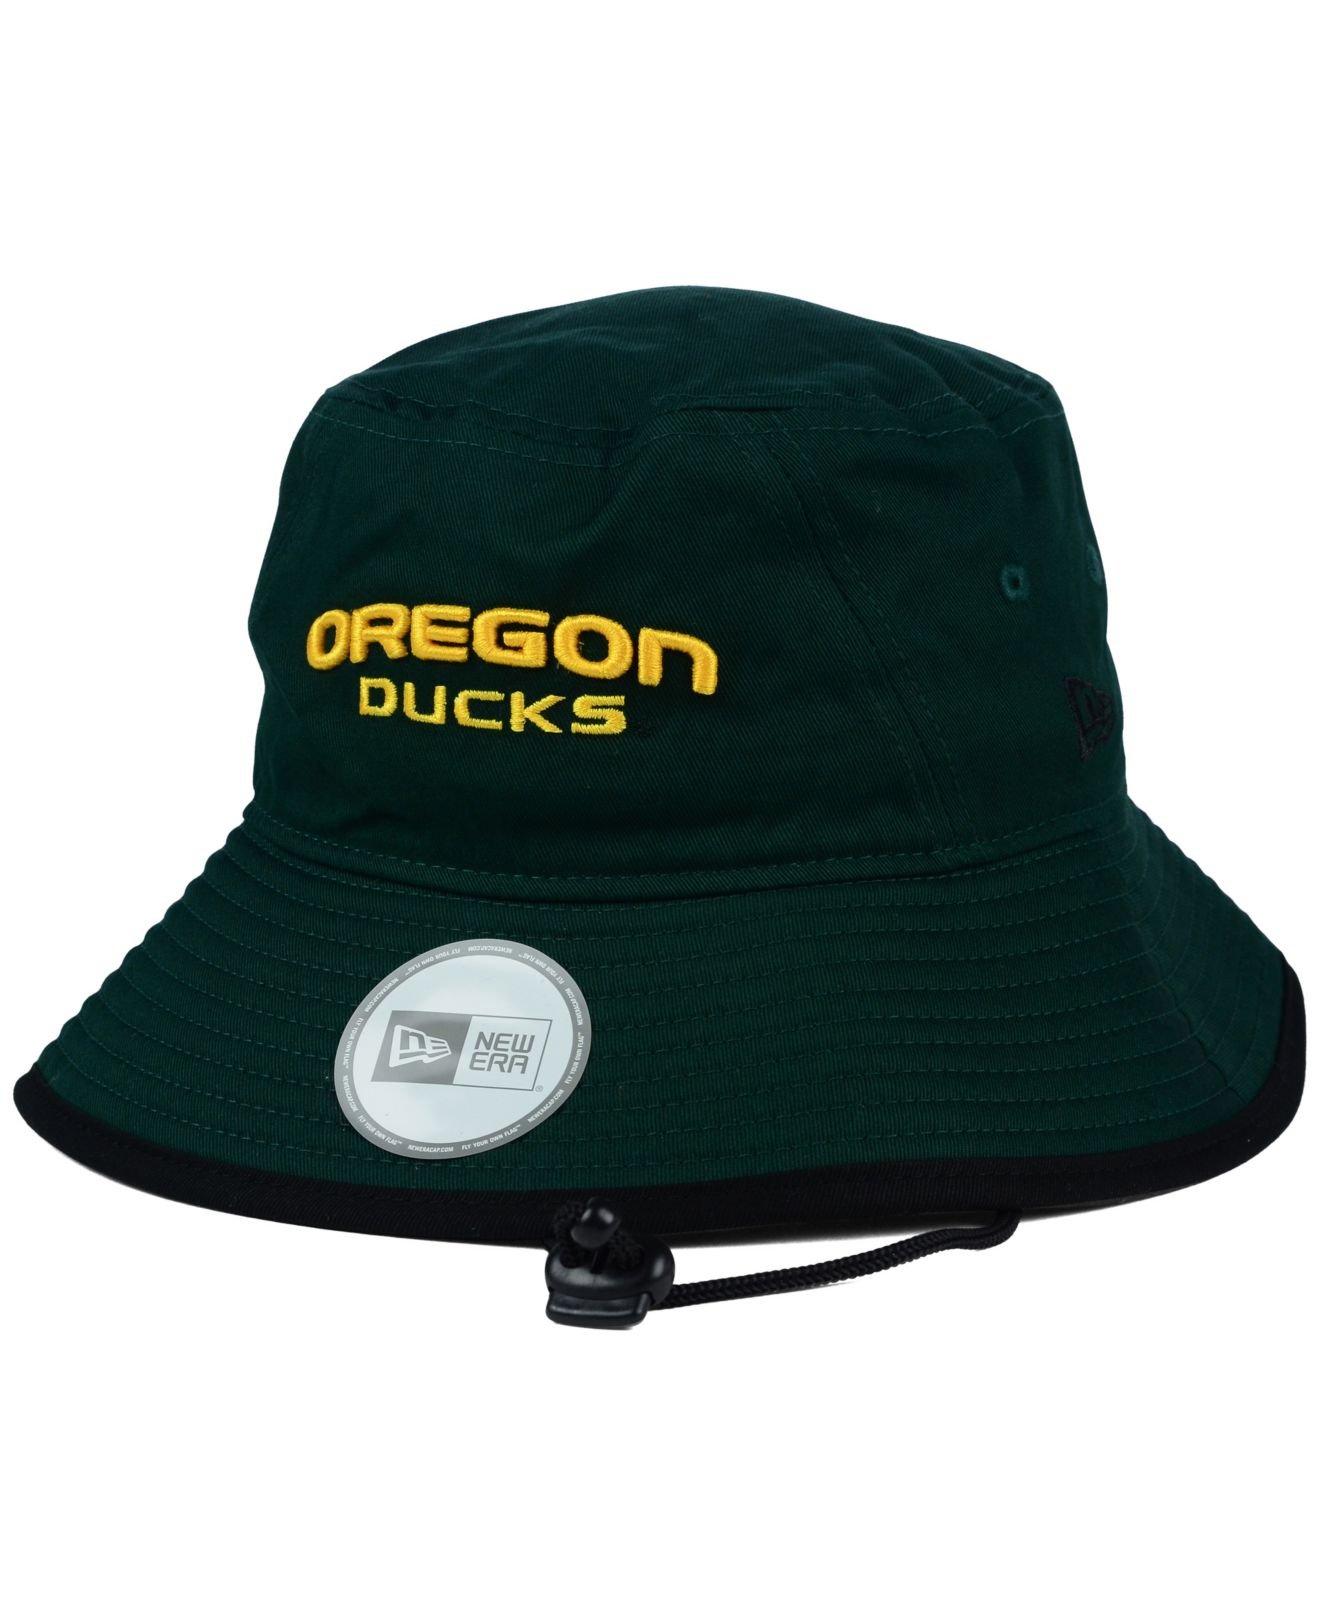 1ce165e8 sweden oregon ducks bucket hat 3582a da738